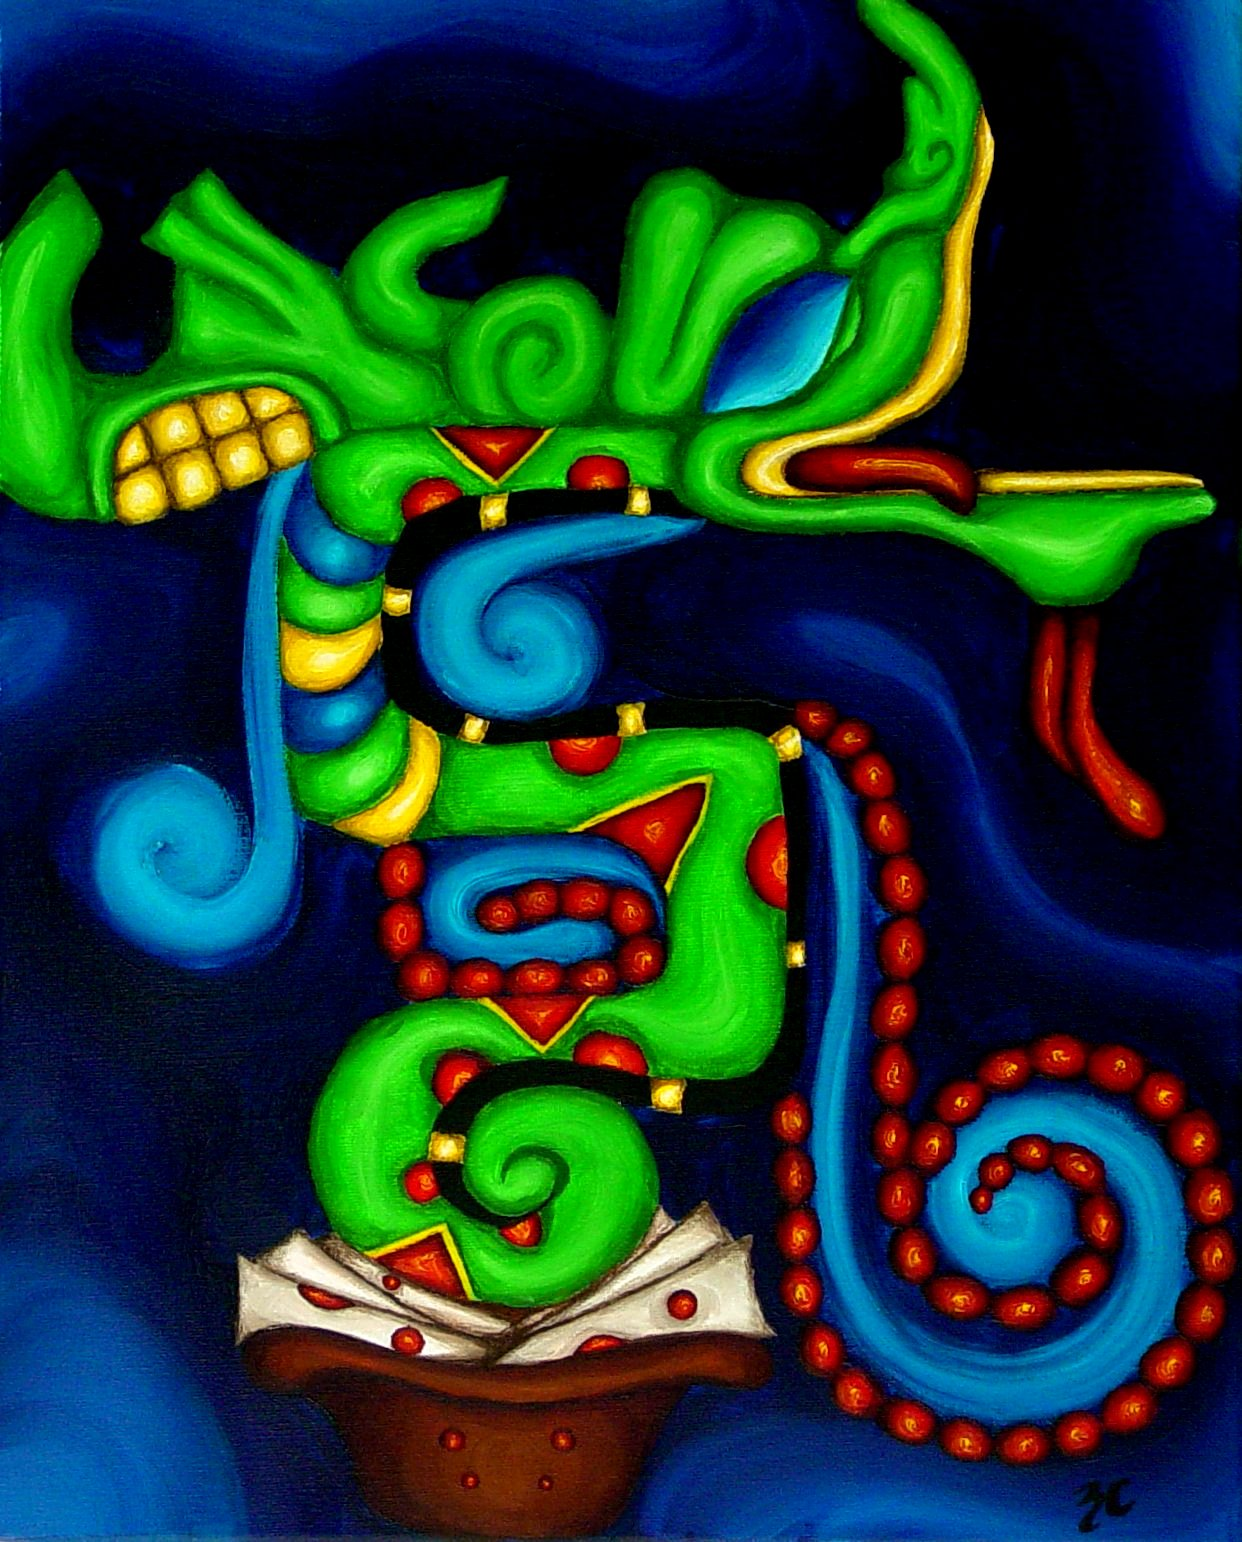 Vision Serpent